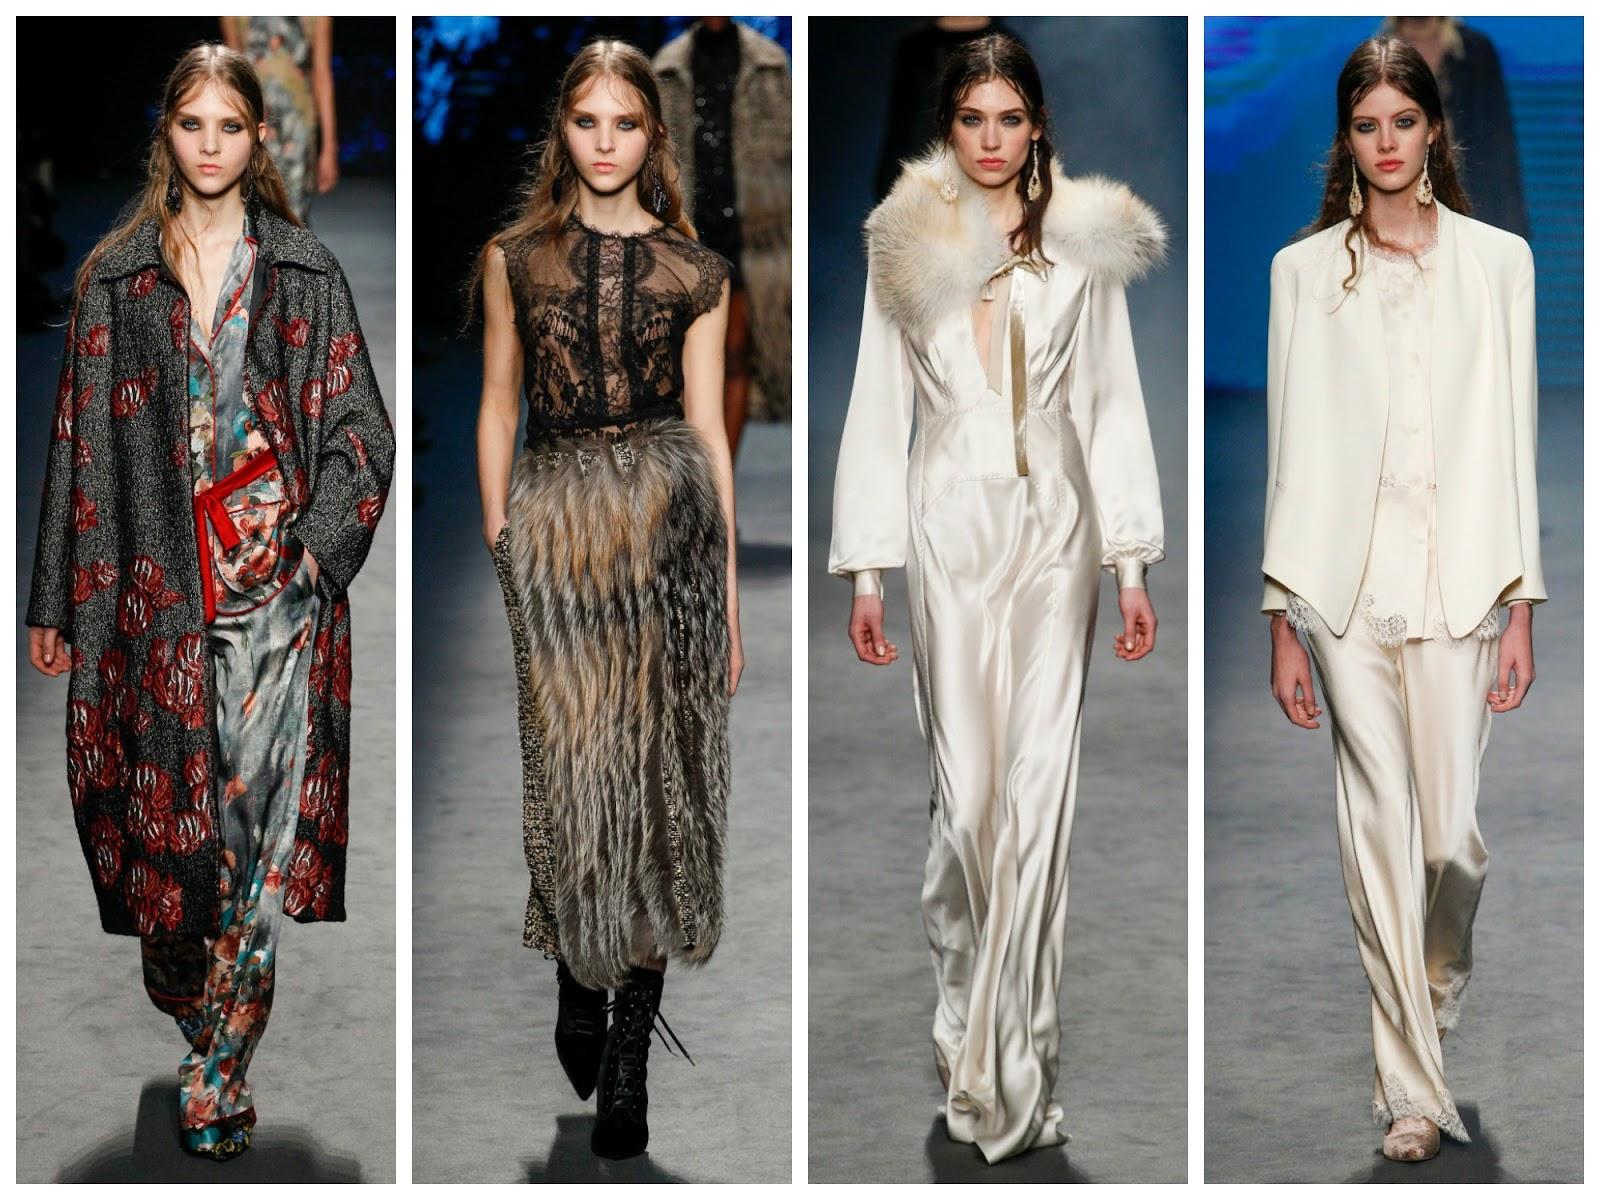 alberta-ferretti-fall-winter-2016-fashion-show-milan